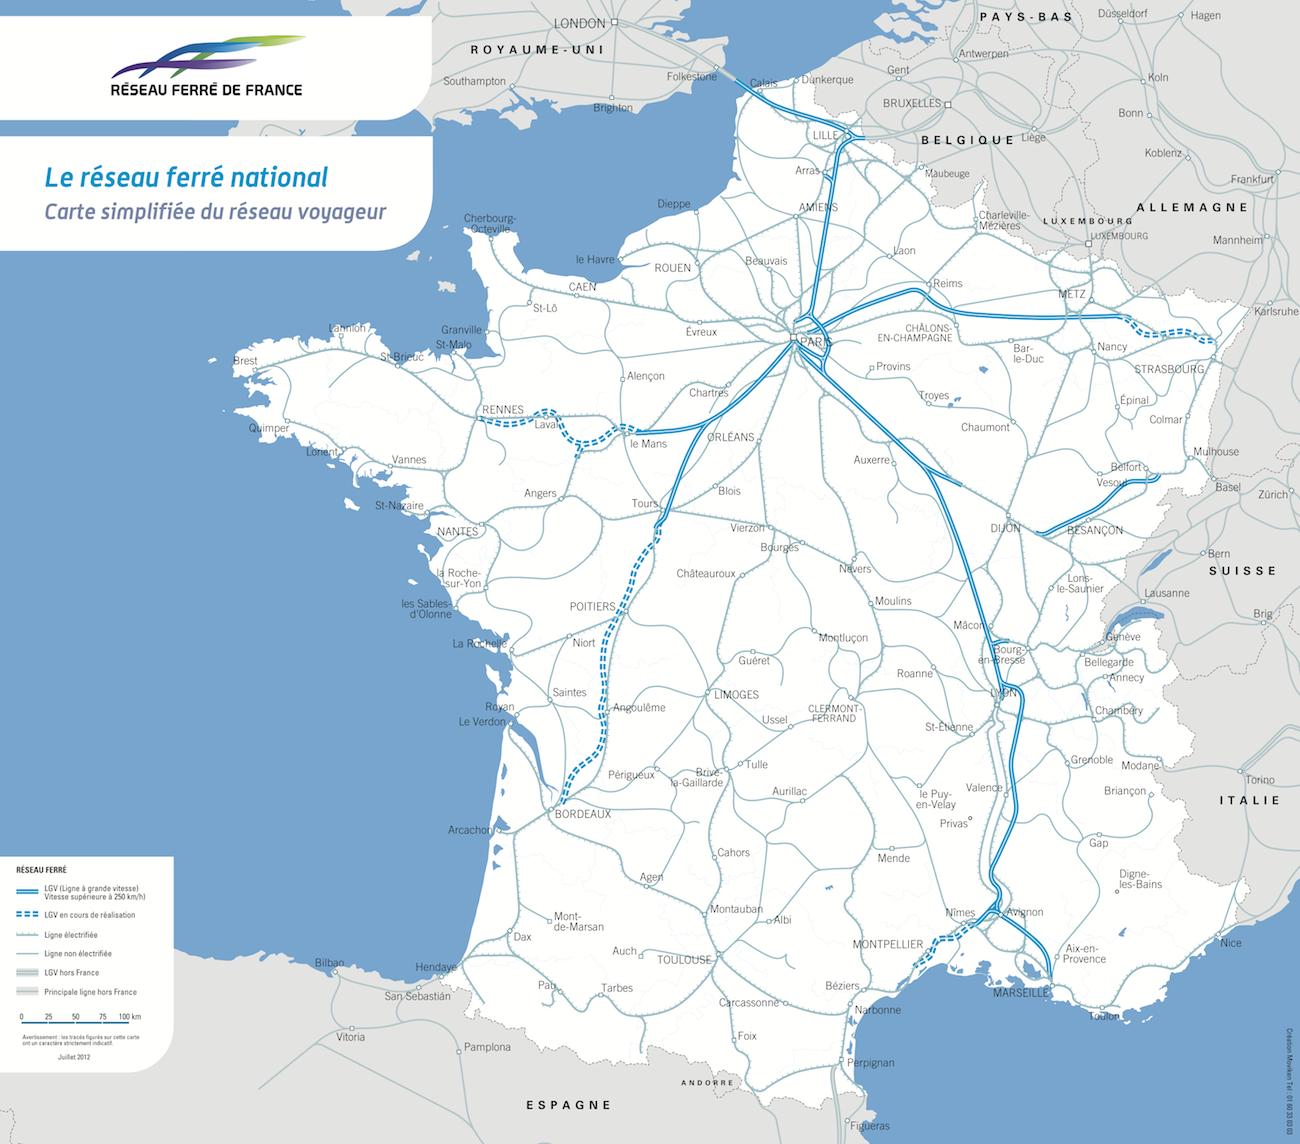 France - TGV (2012) - PopulationData.net